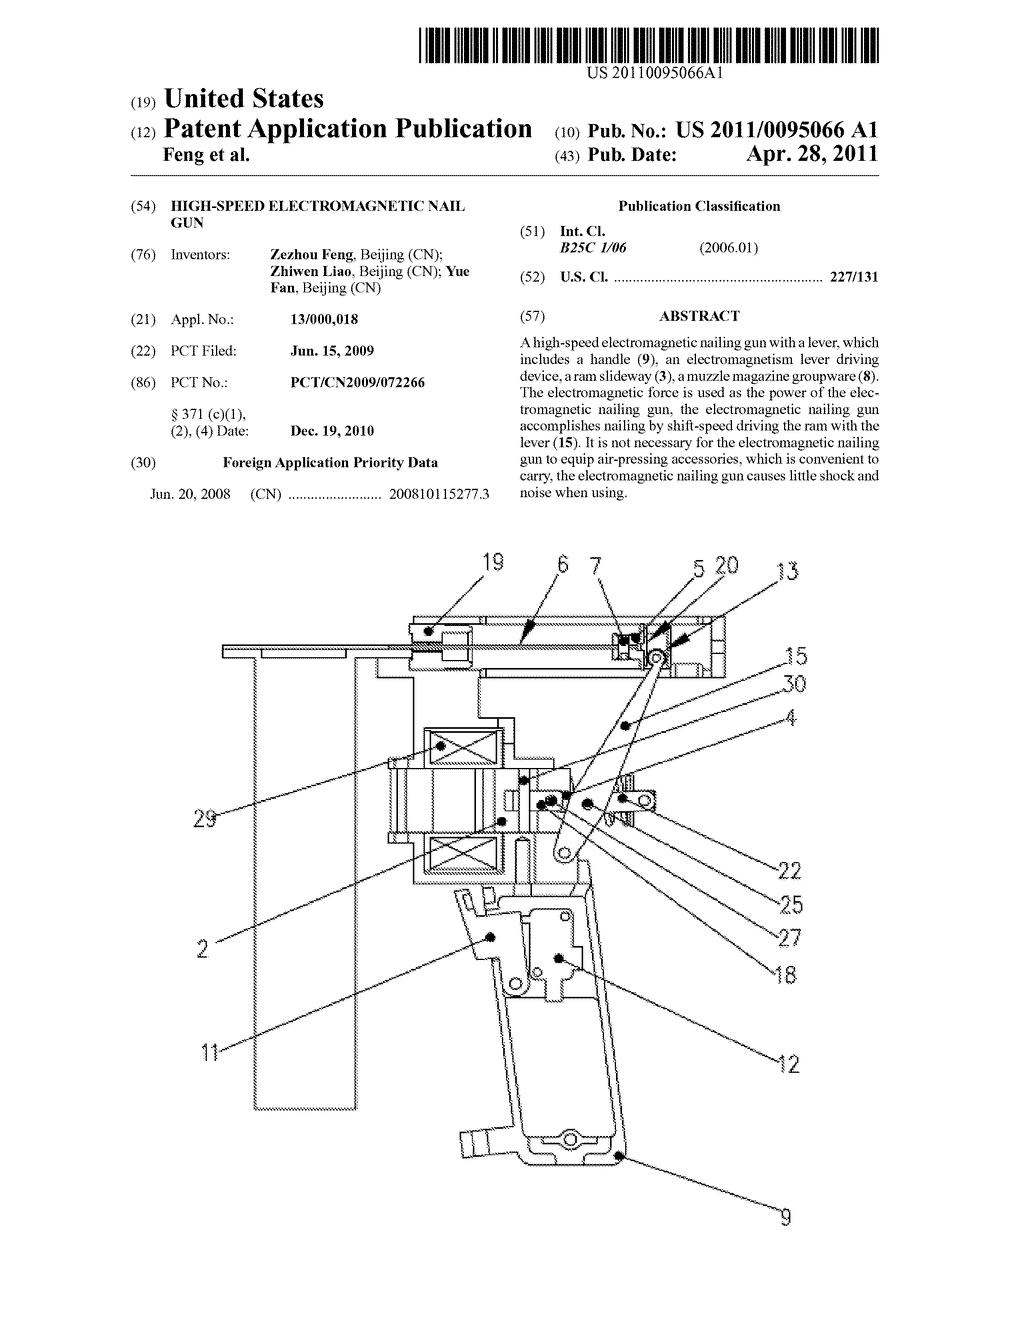 hitachi nail gun parts diagram opel corsa radio wiring 16 images